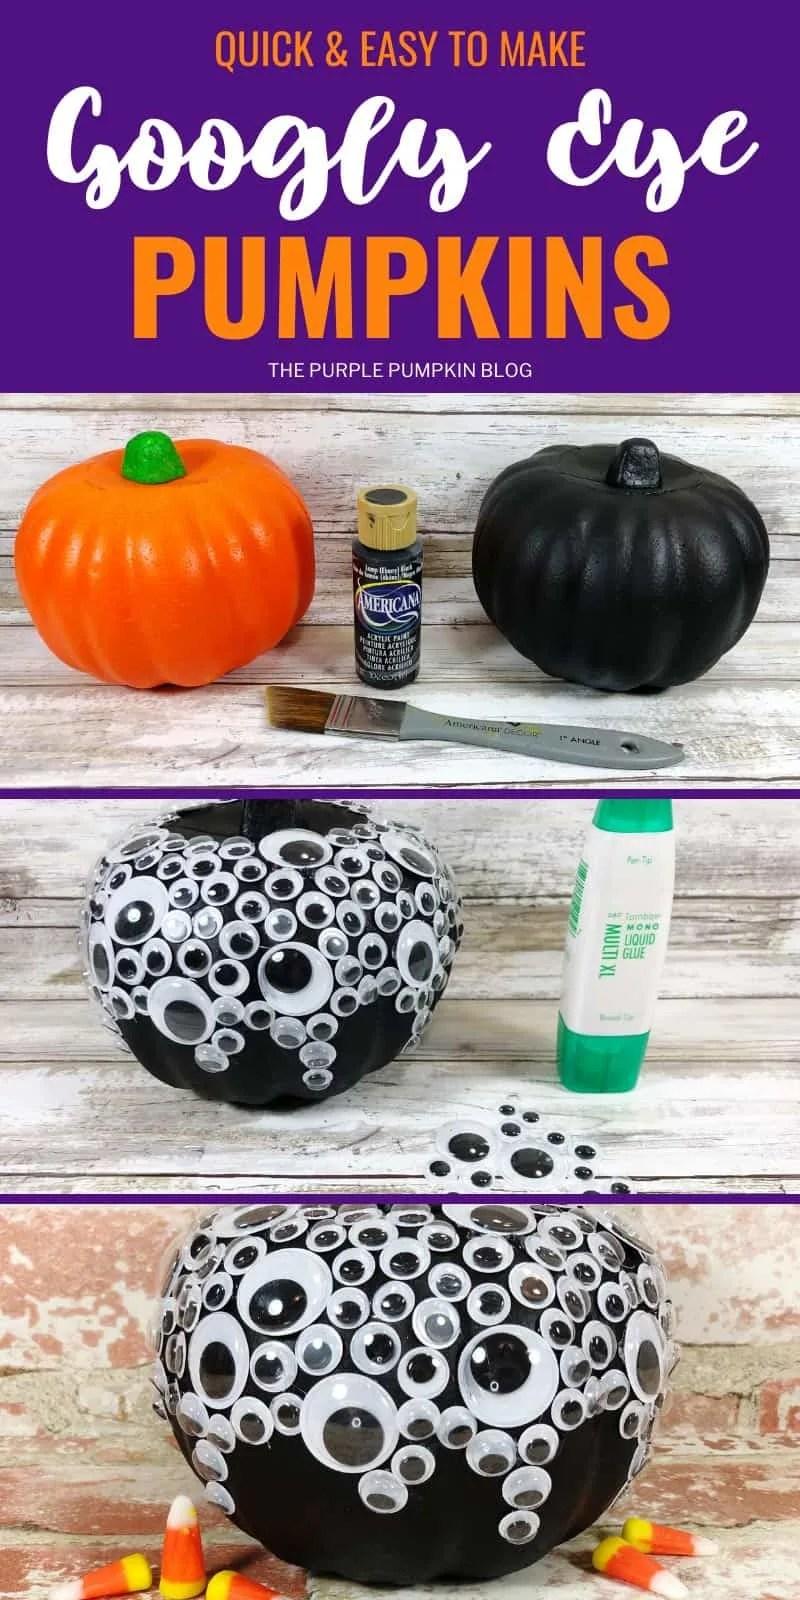 Quick & Easy to Make Googly Eye Pumpkins